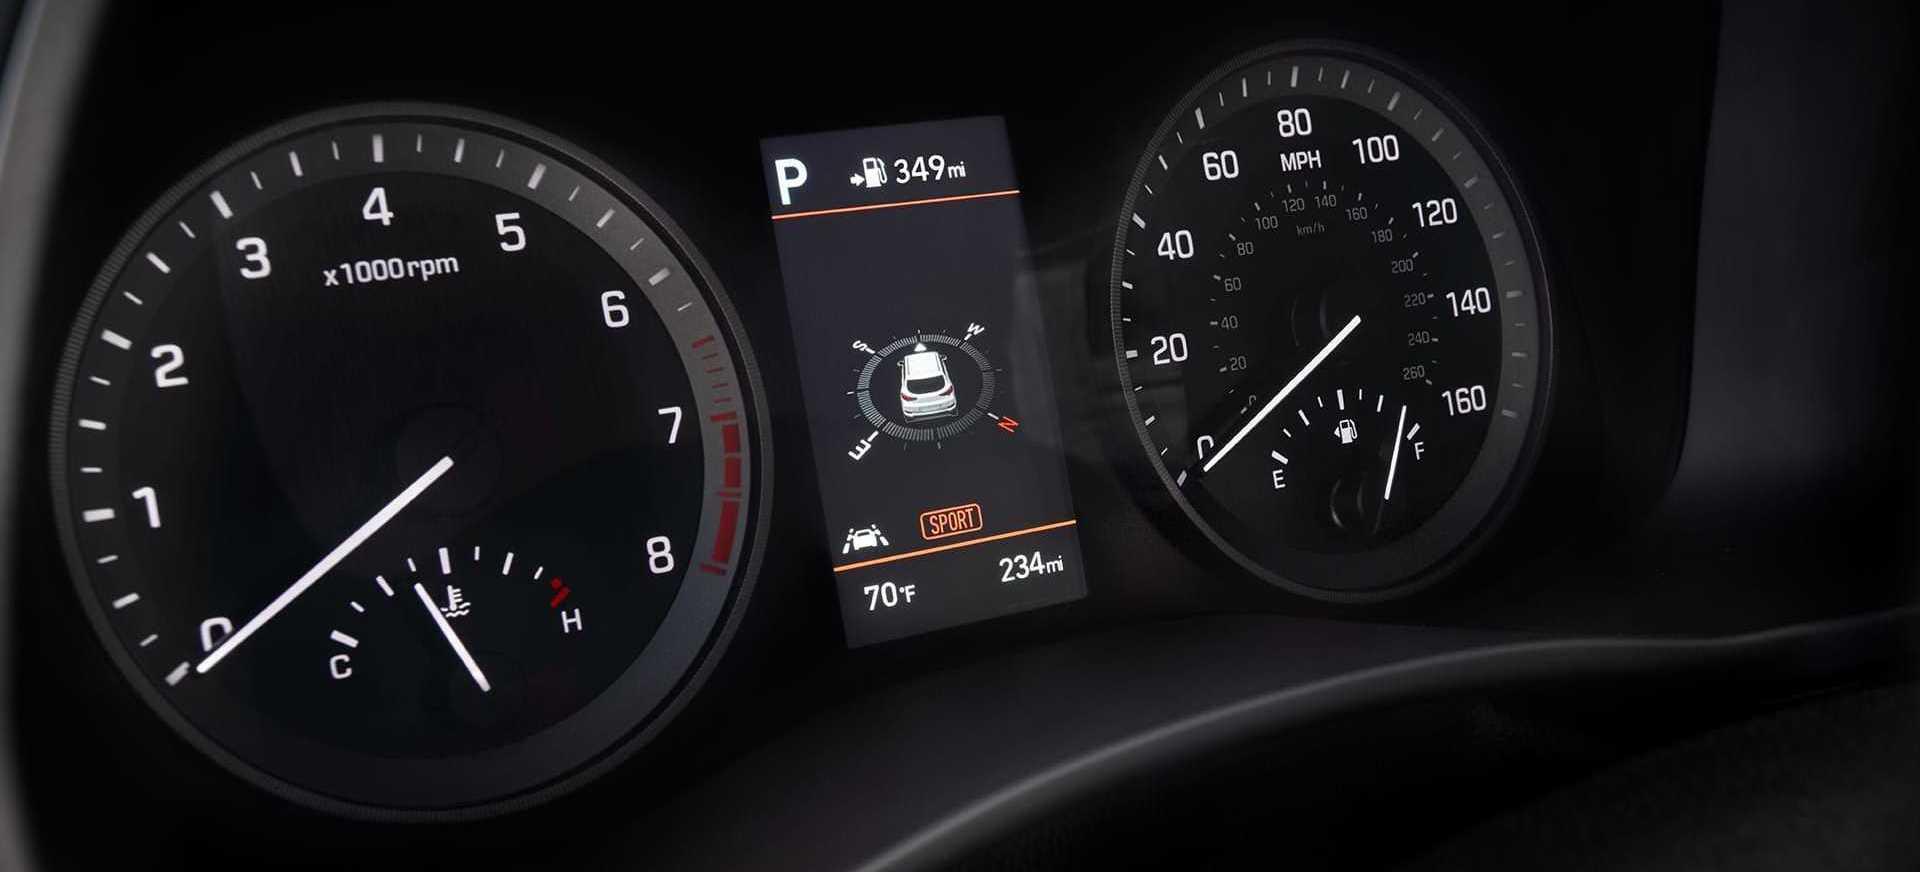 2020 Hyundai Tucson Information Display